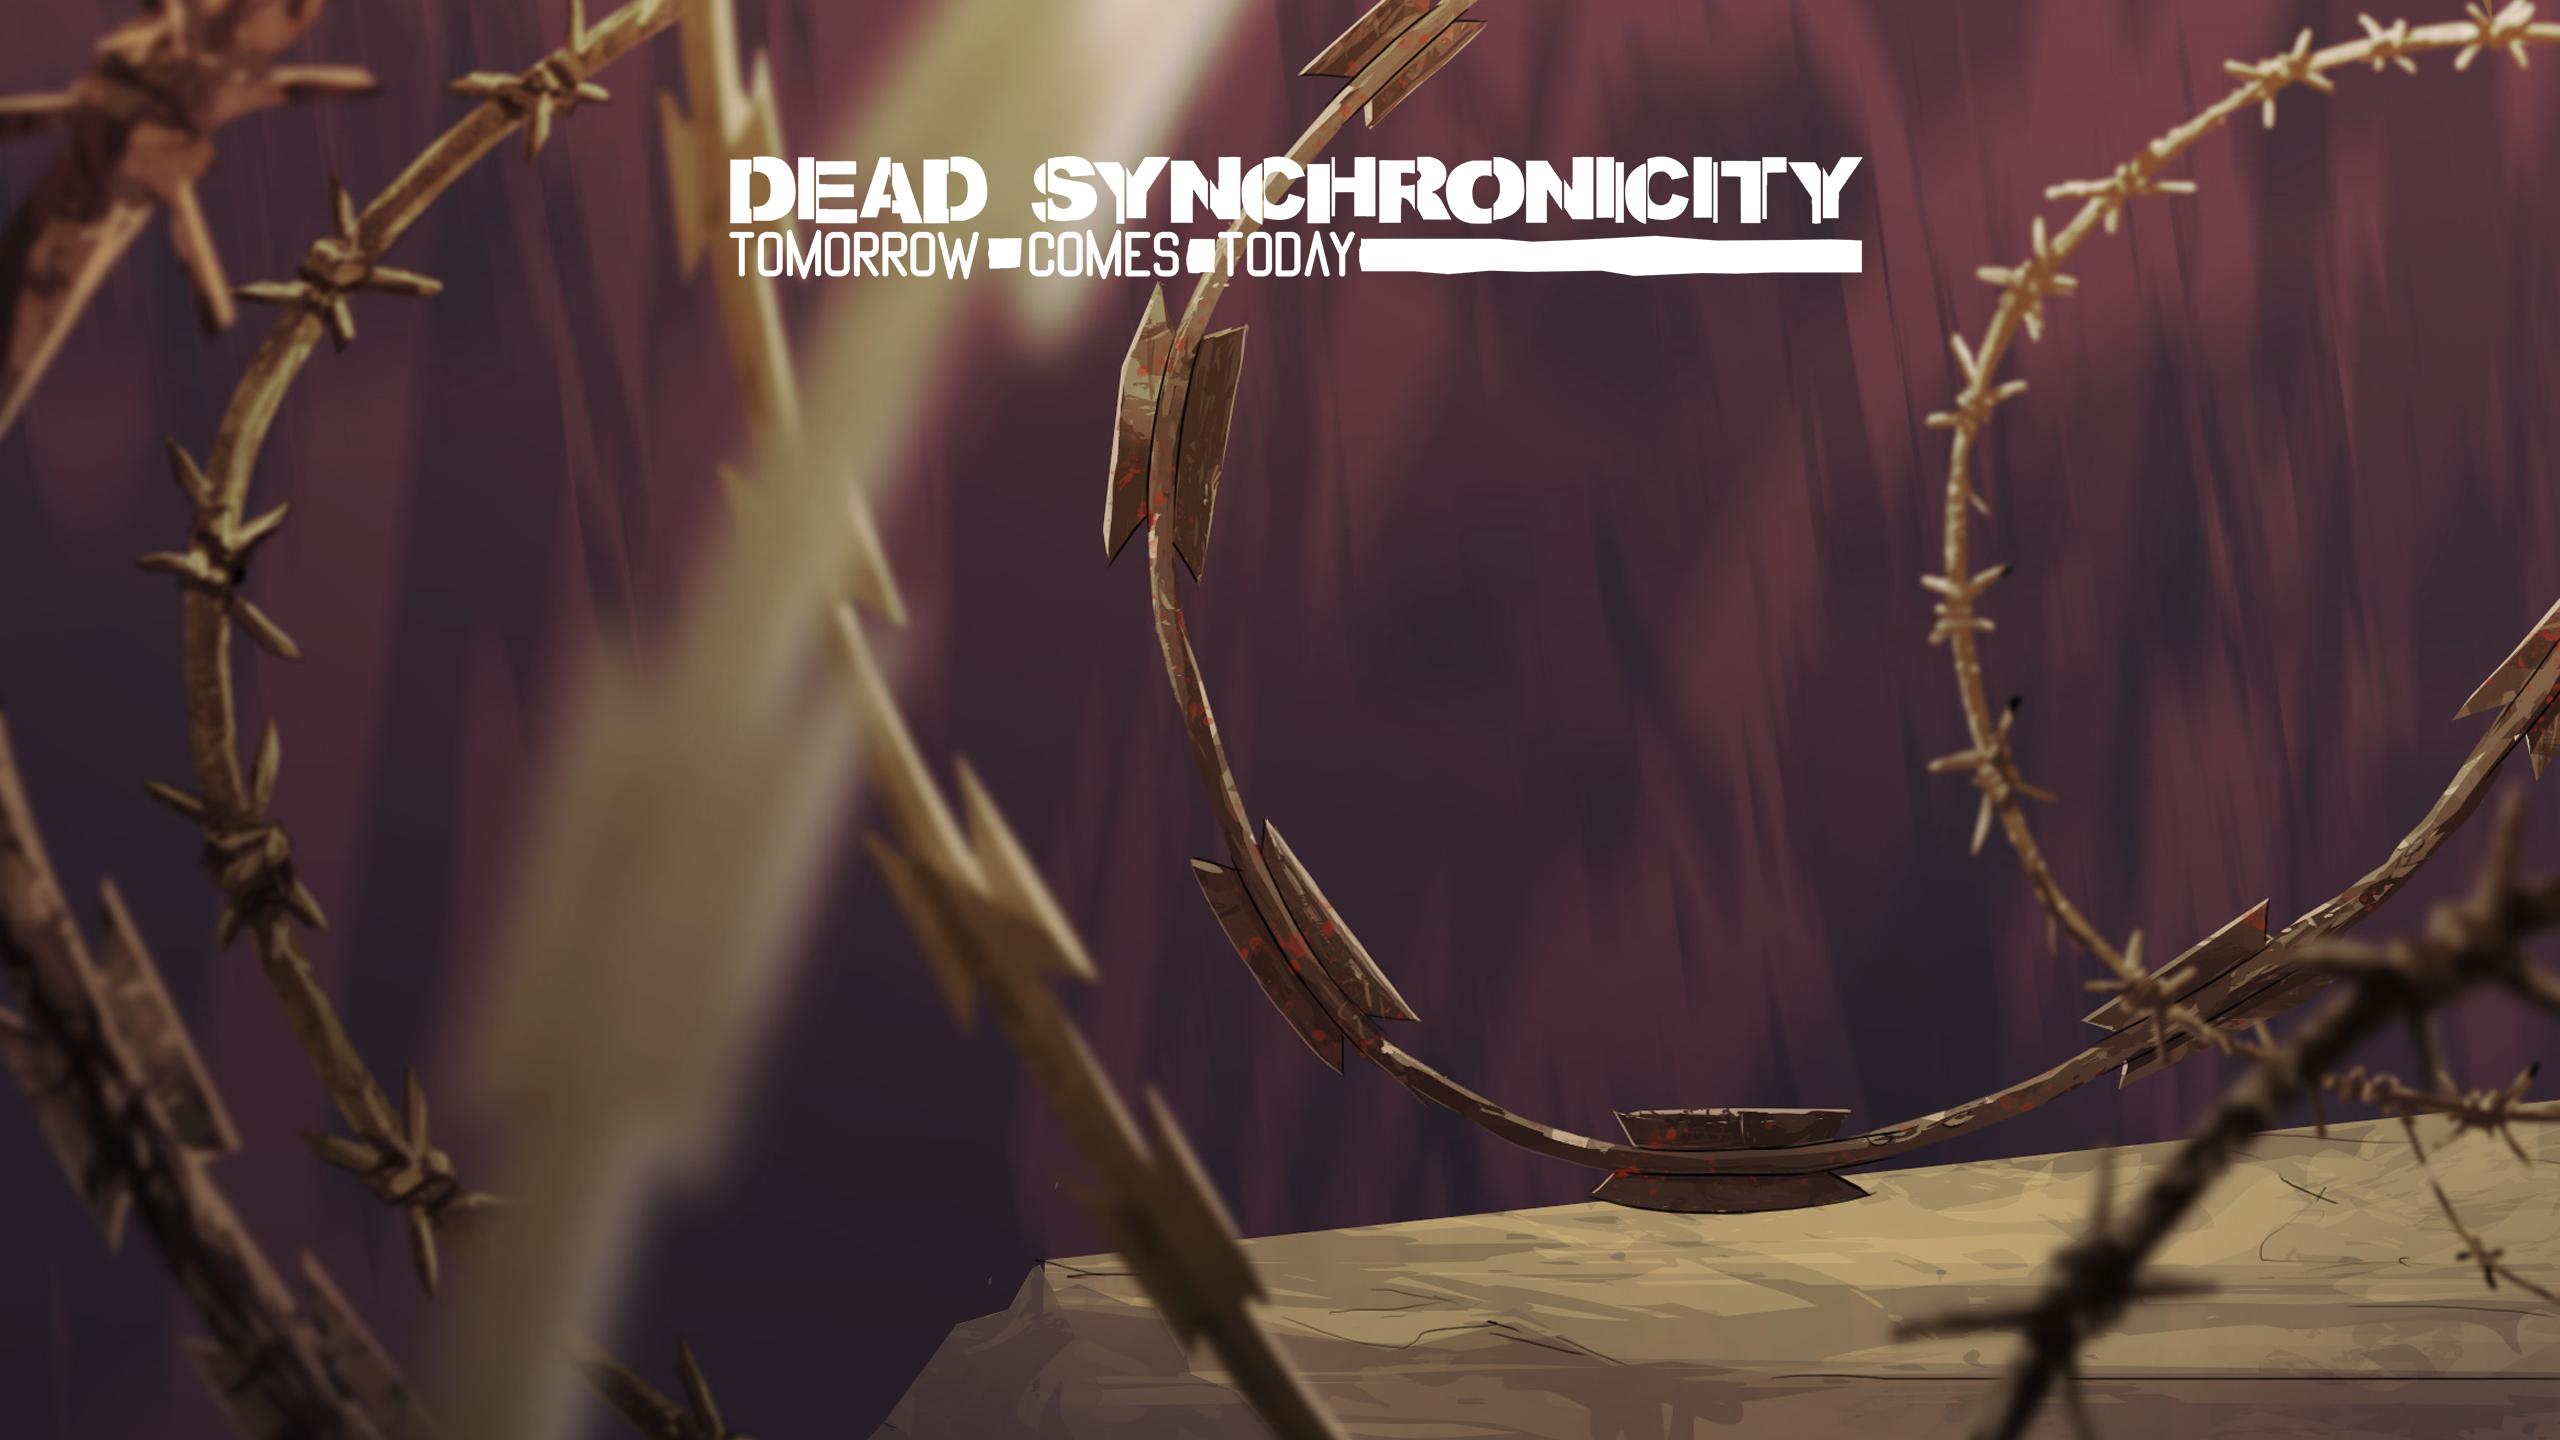 dead-synchronicity-wallpaper-14